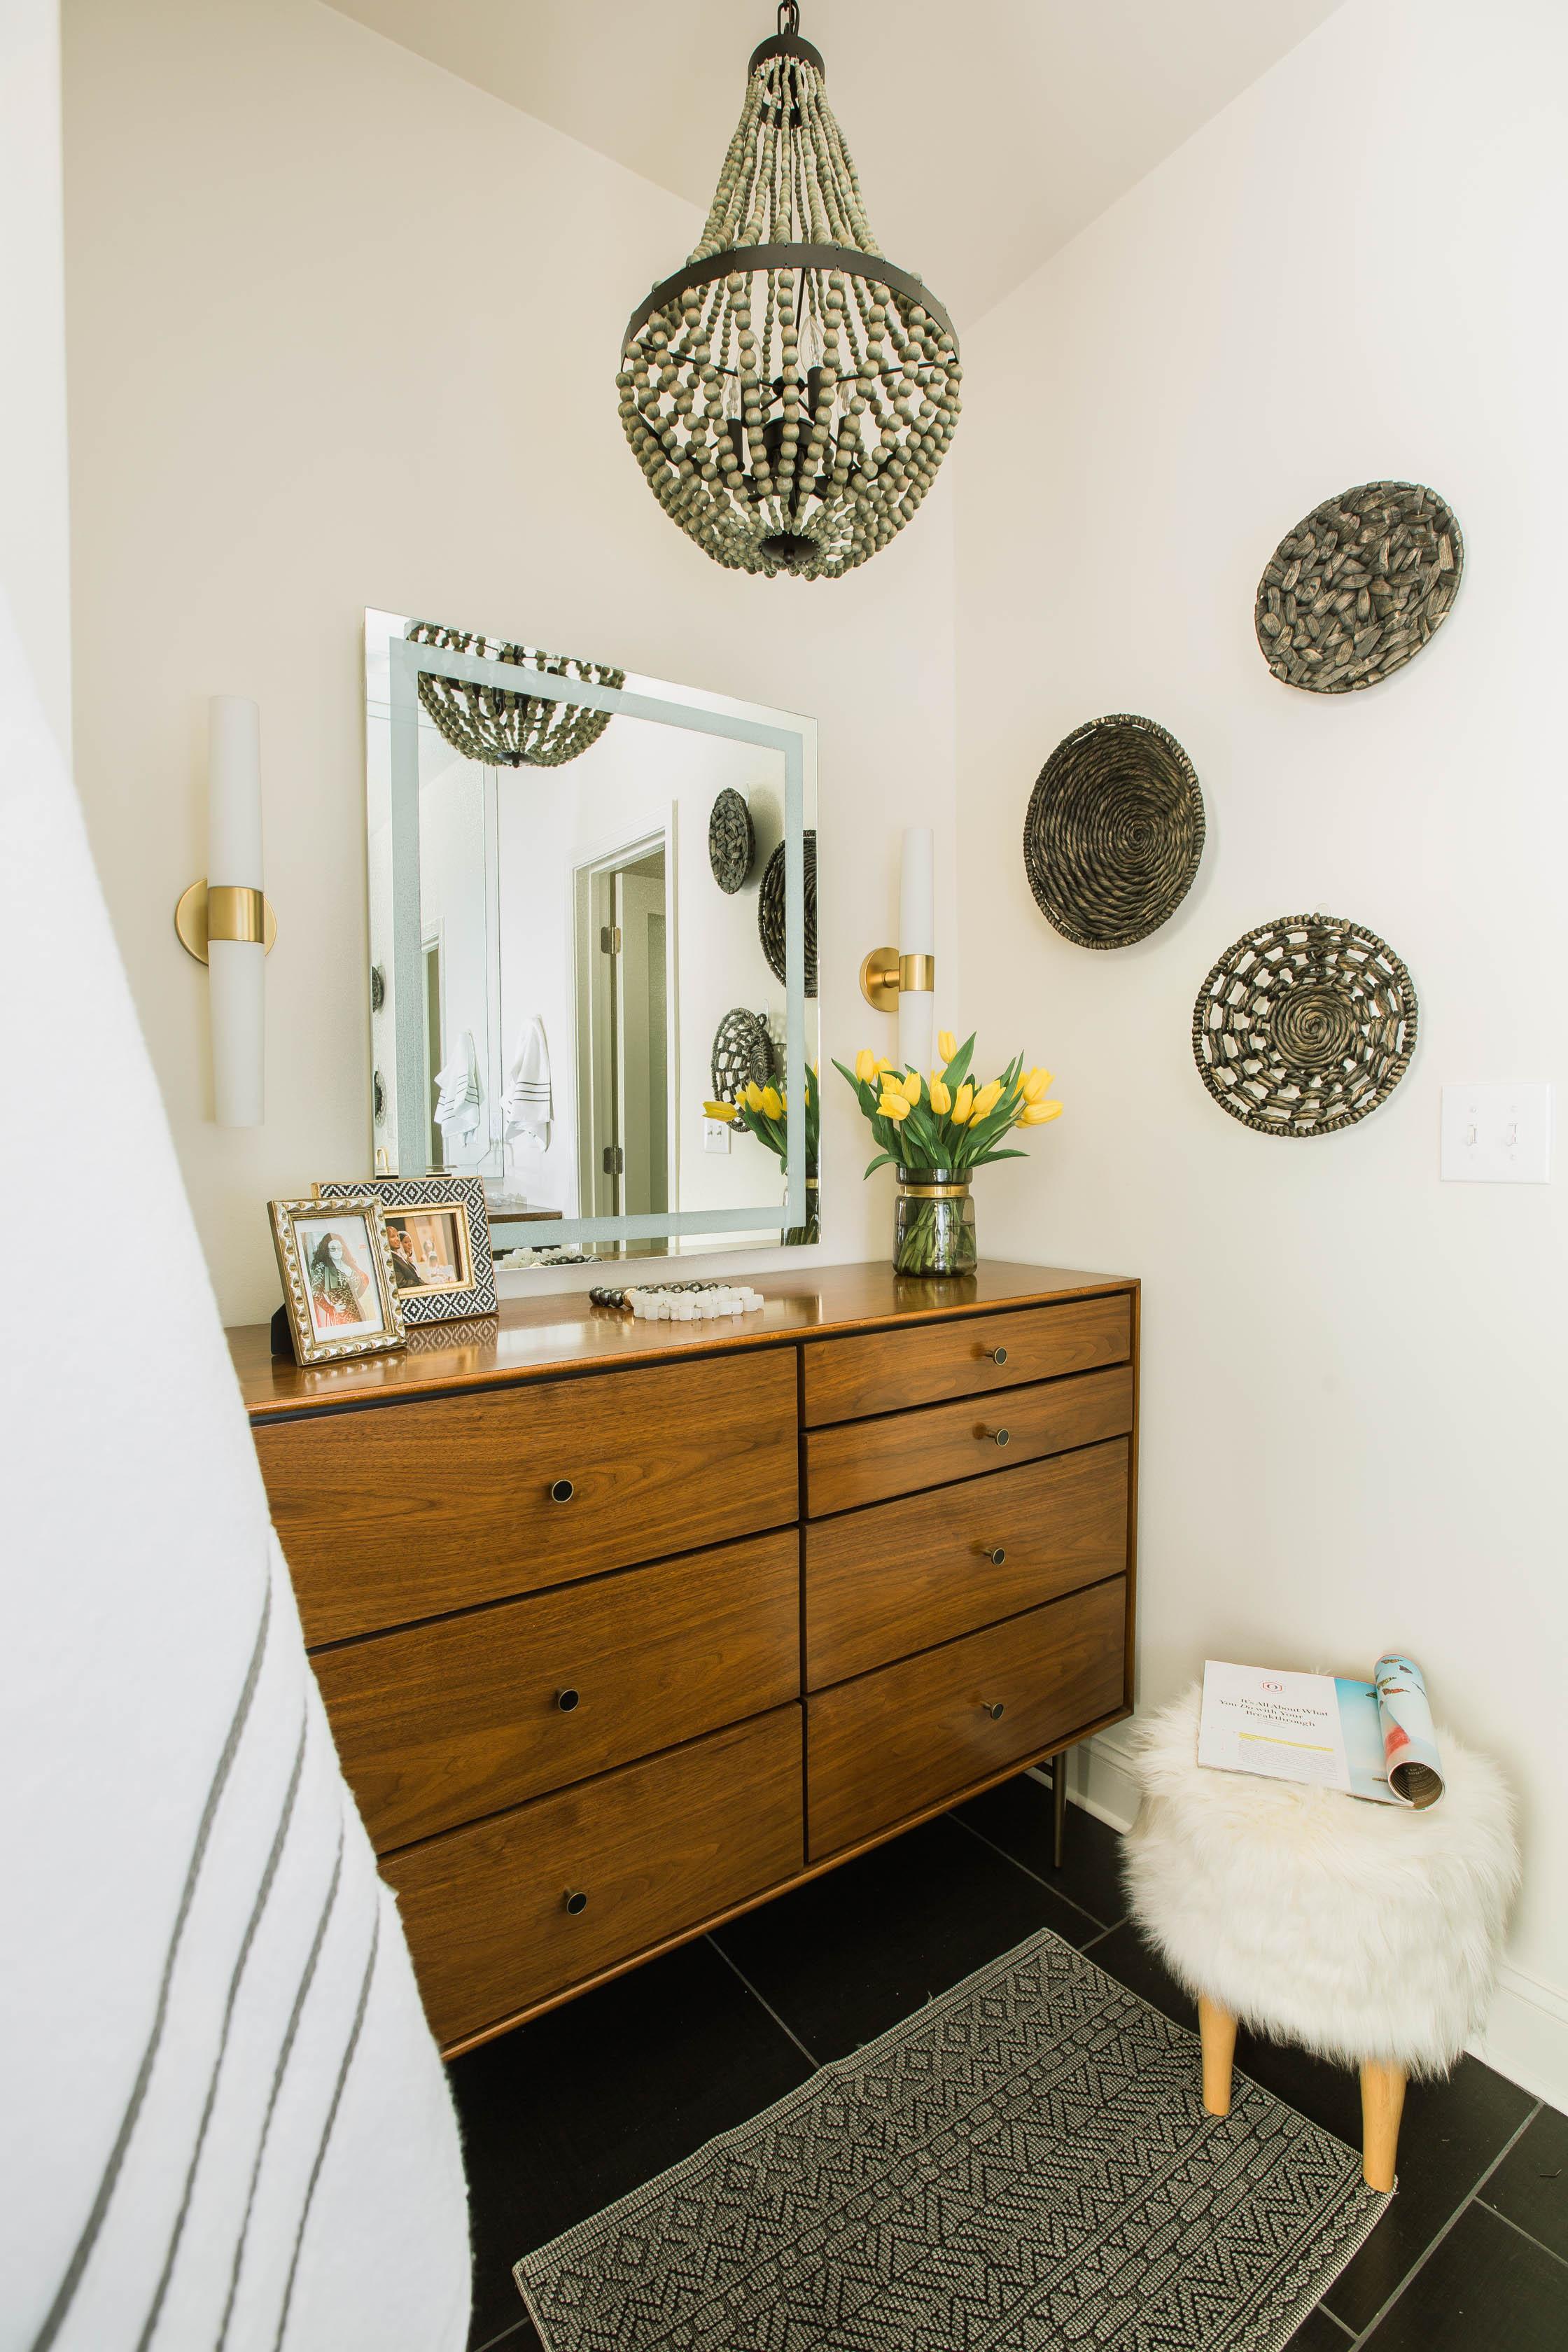 Dayka Robinson Brookside Oak Master Bathroom Renovation Robert Allen Wavy Stitch West Elm Heston Dresser Subway Tile Brass Kohler 11:2015